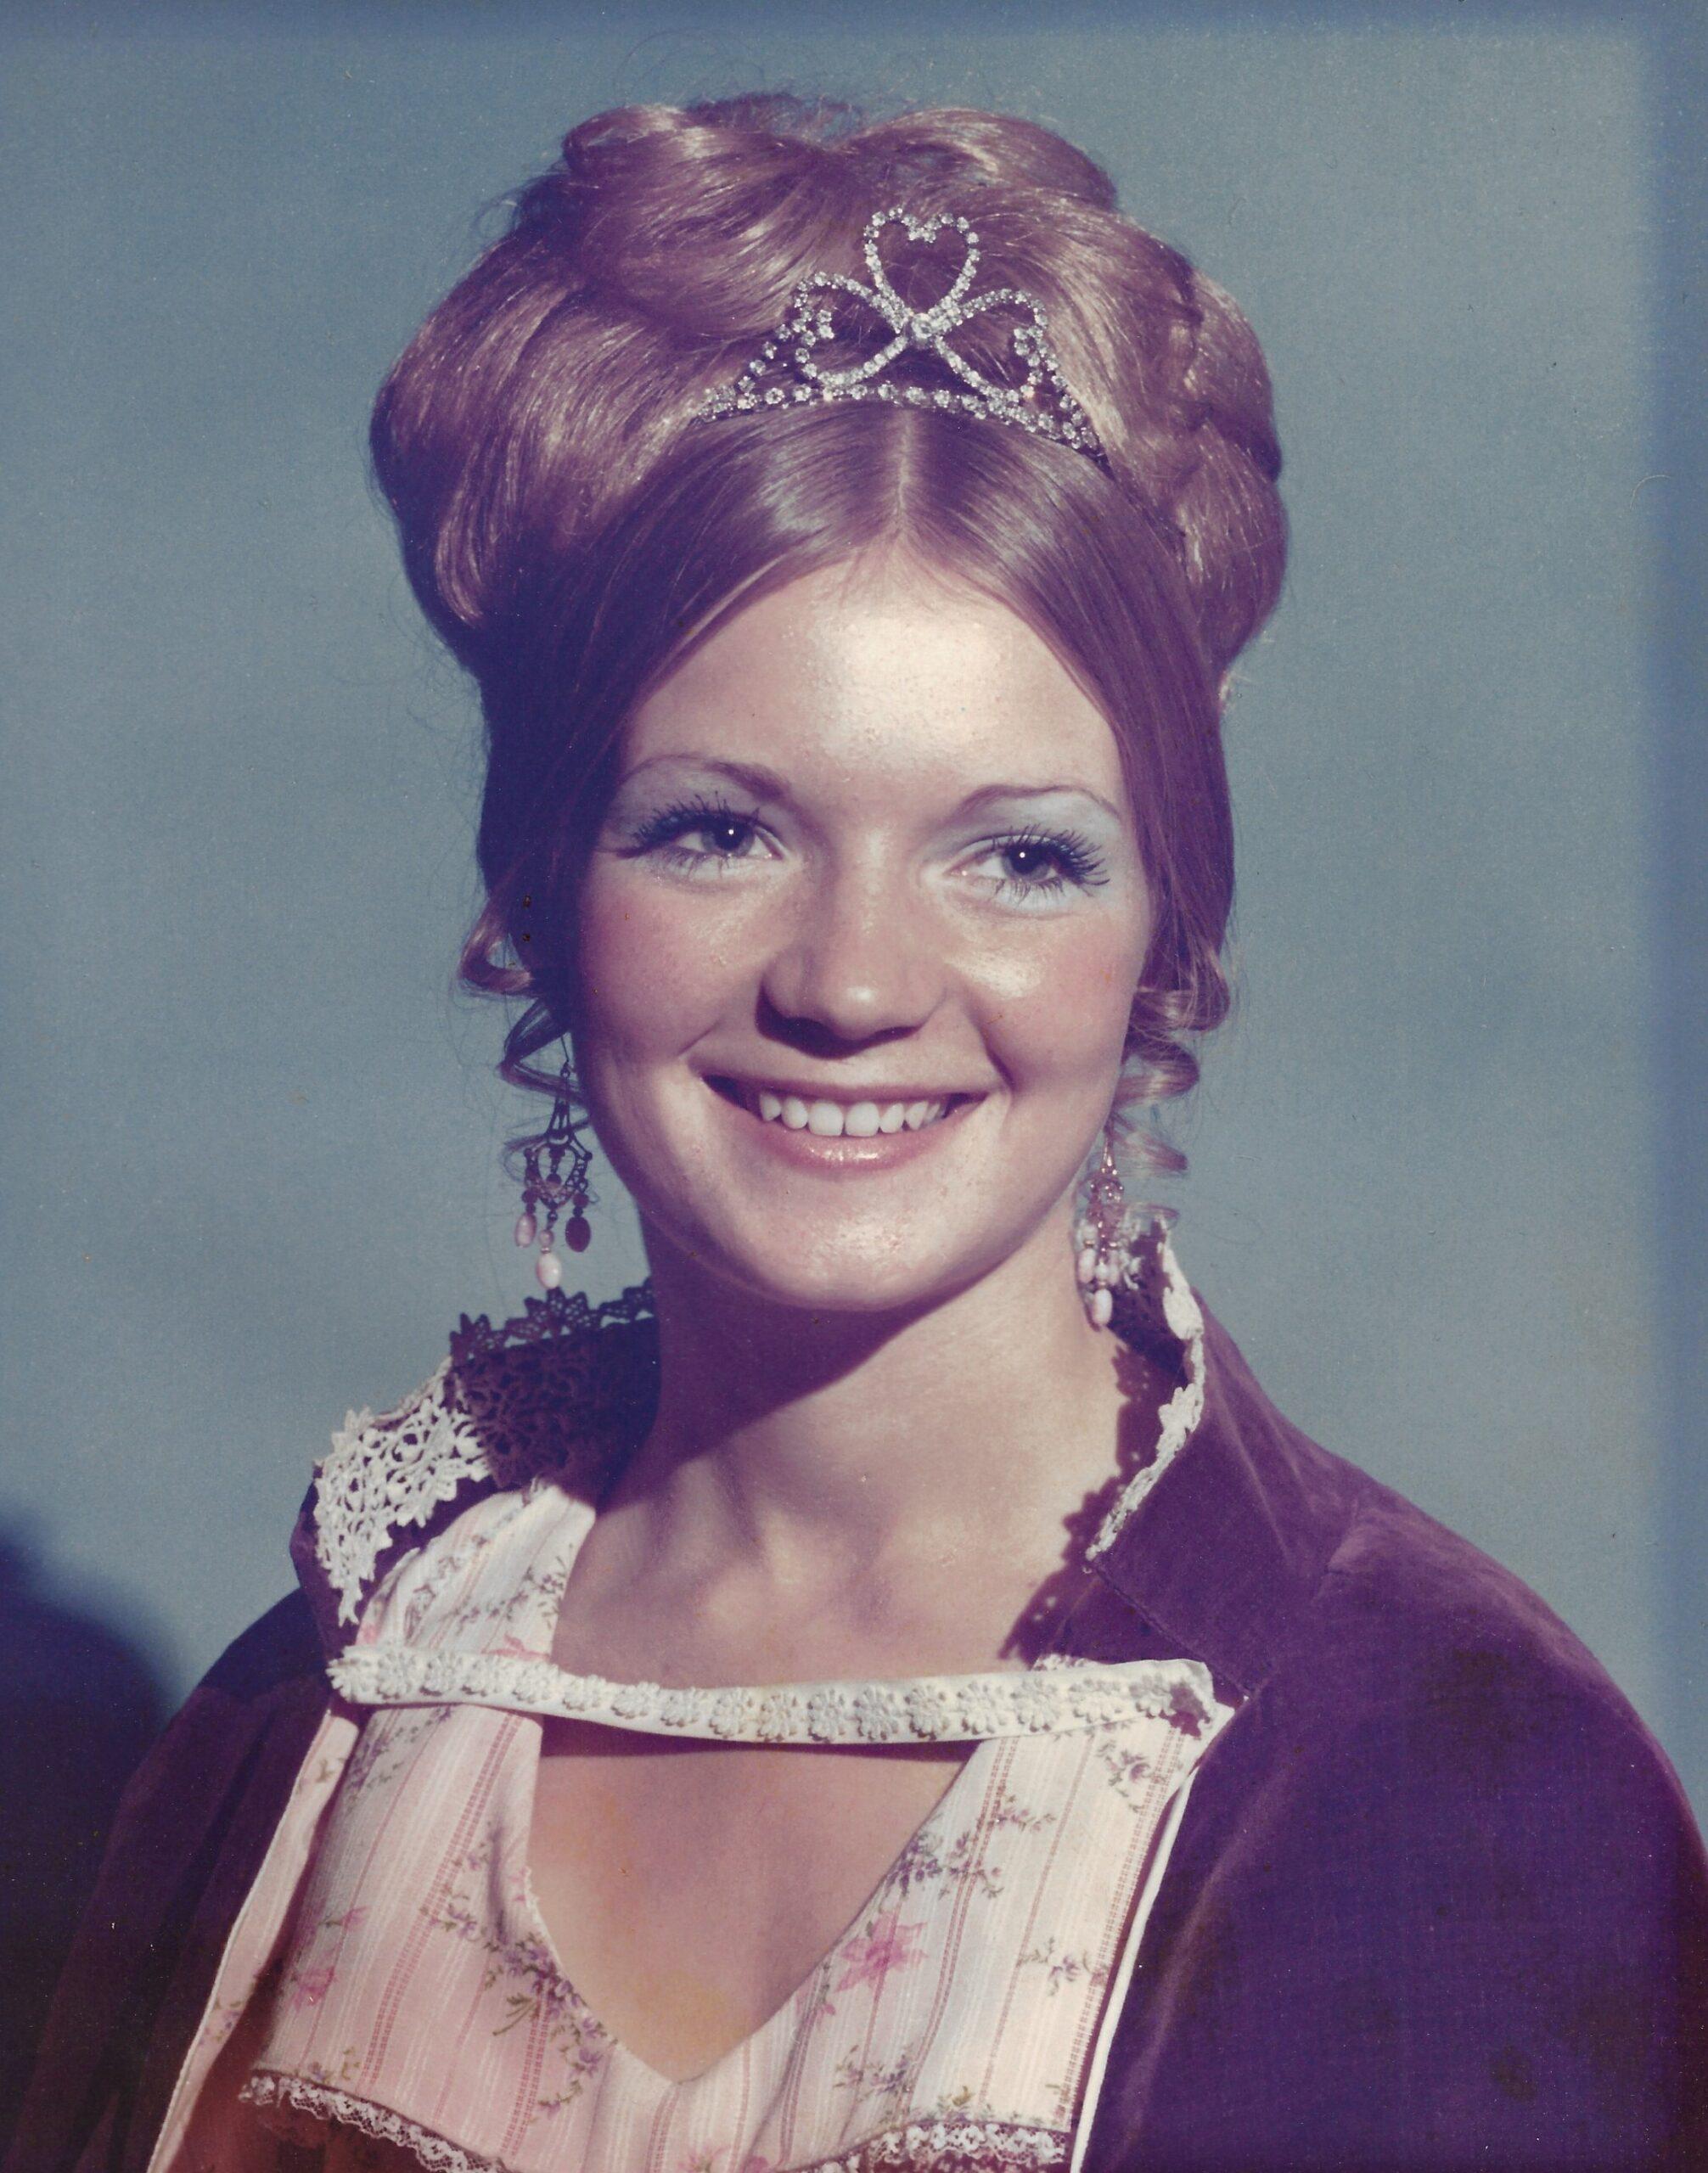 1973 Lincoln County Fair Queen